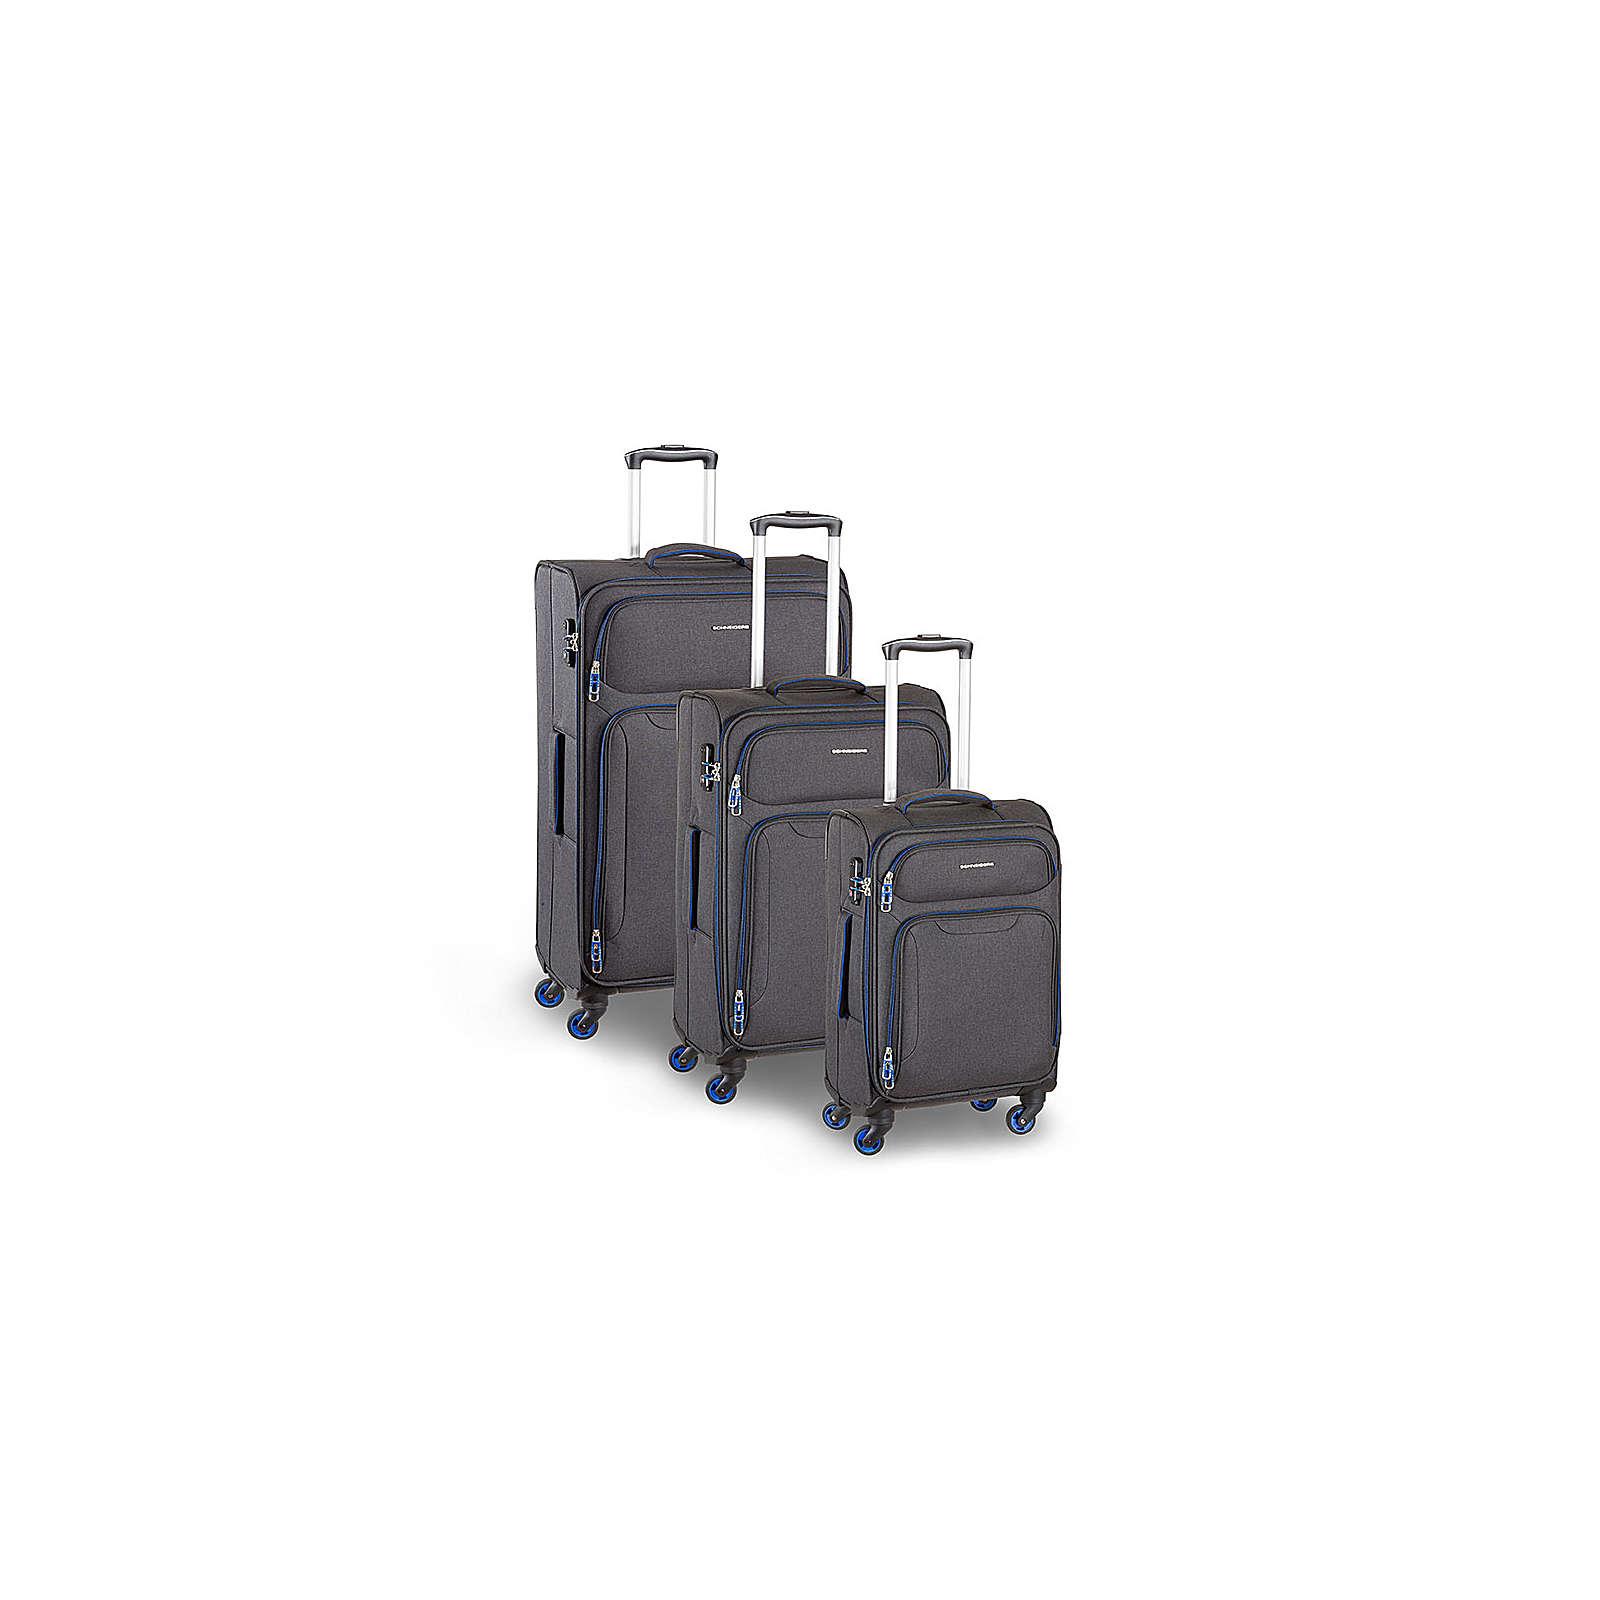 SCHNEIDERS Koffer Set Palma 3 Teilig Koffer grau